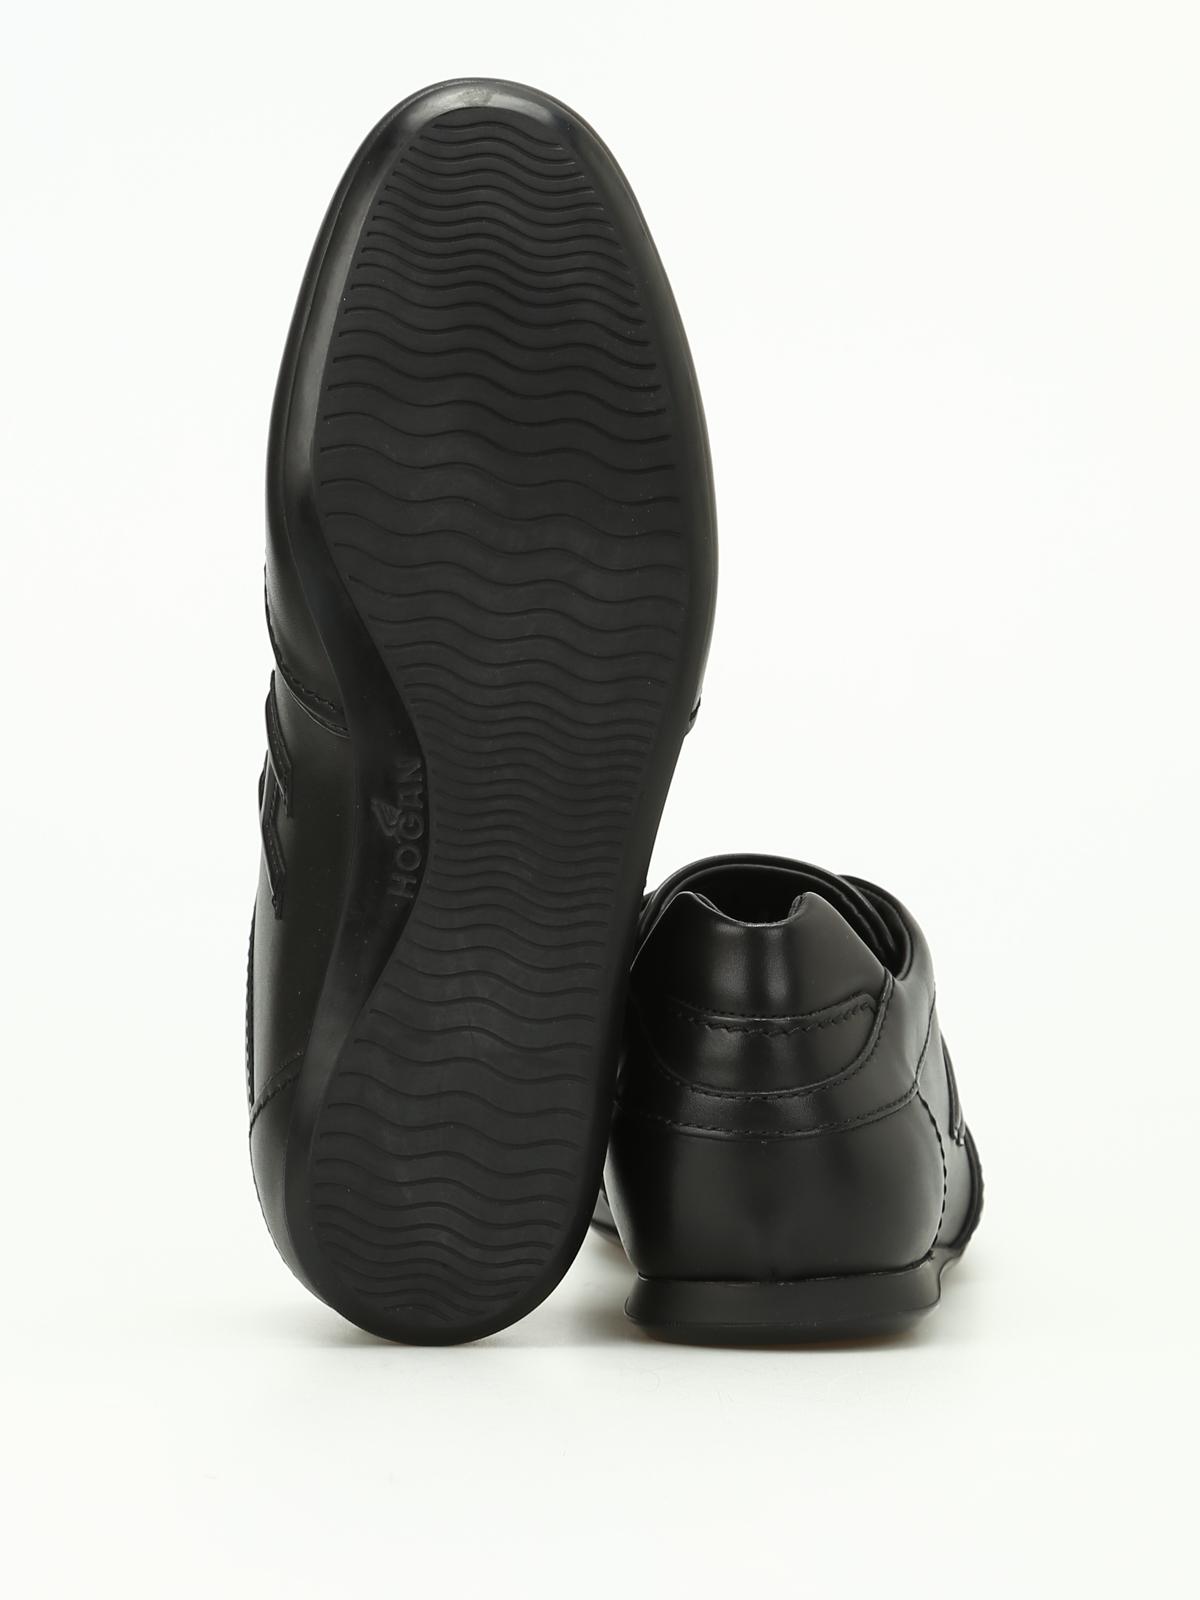 Sneakers Hogan - Olympia nere in pelle - HXM0570I9721POB999 ...